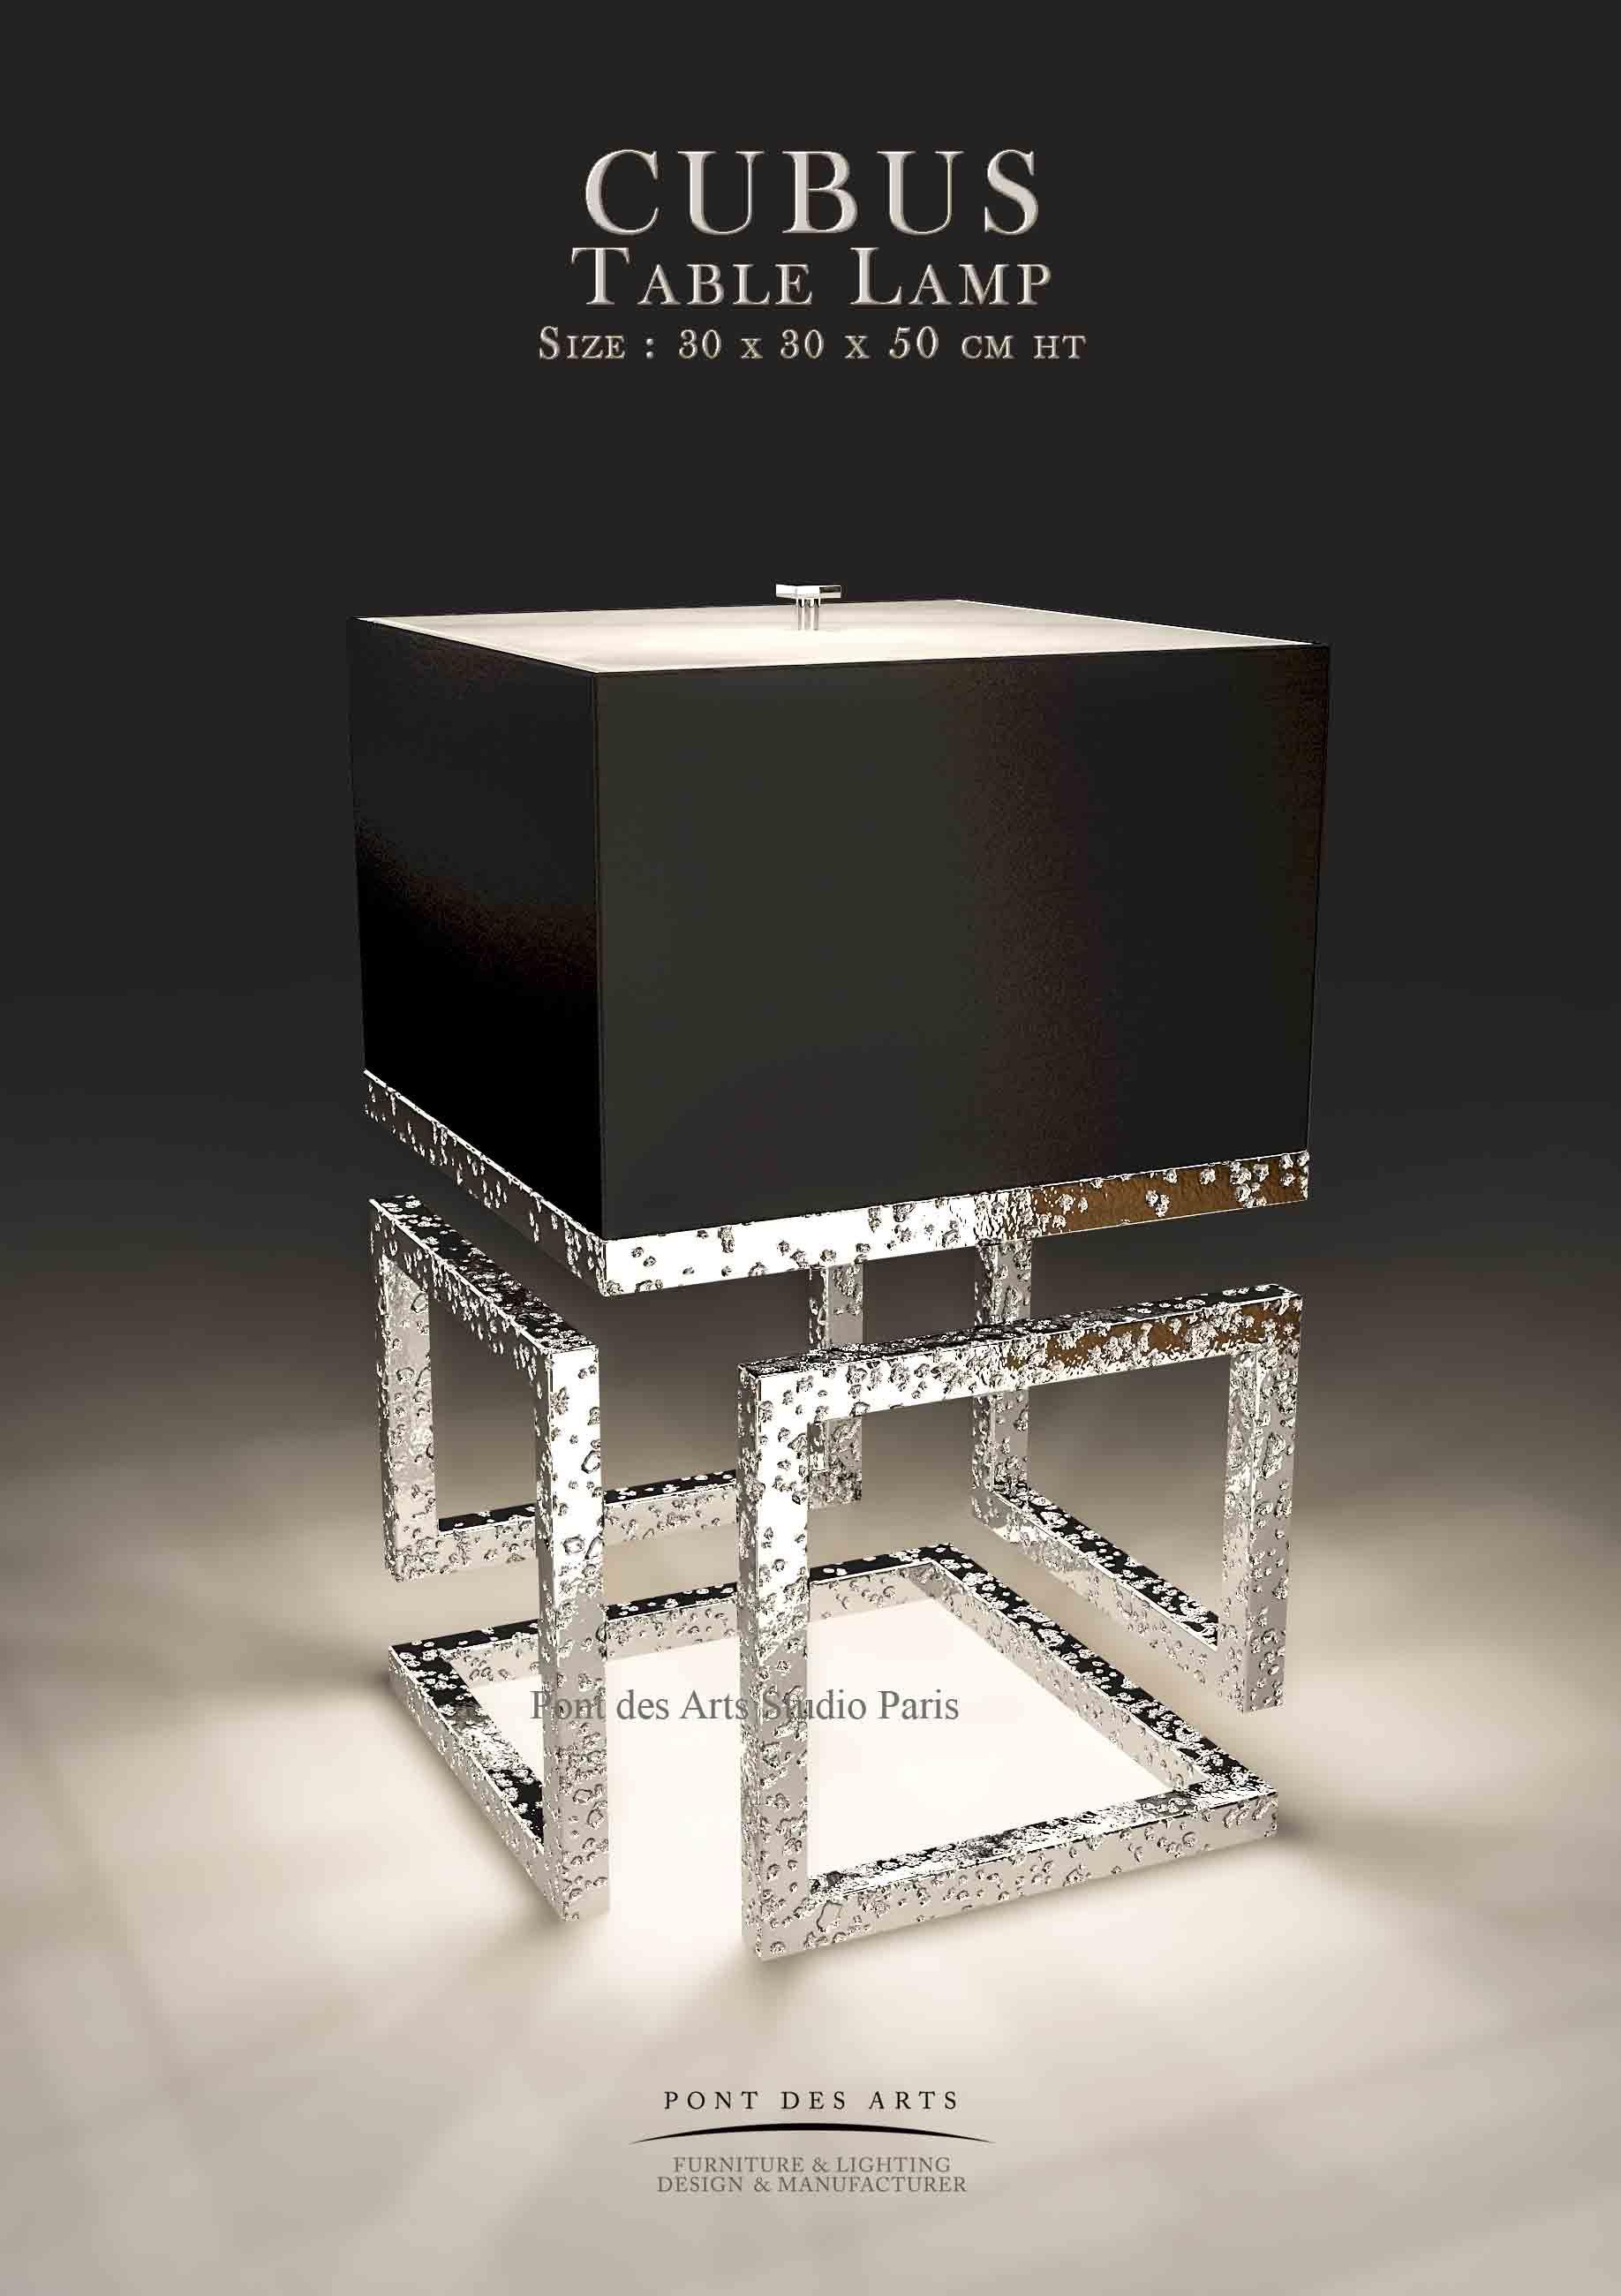 Cubustable Lamp Designer Monzer Hammoud Pont Des Arts Studio